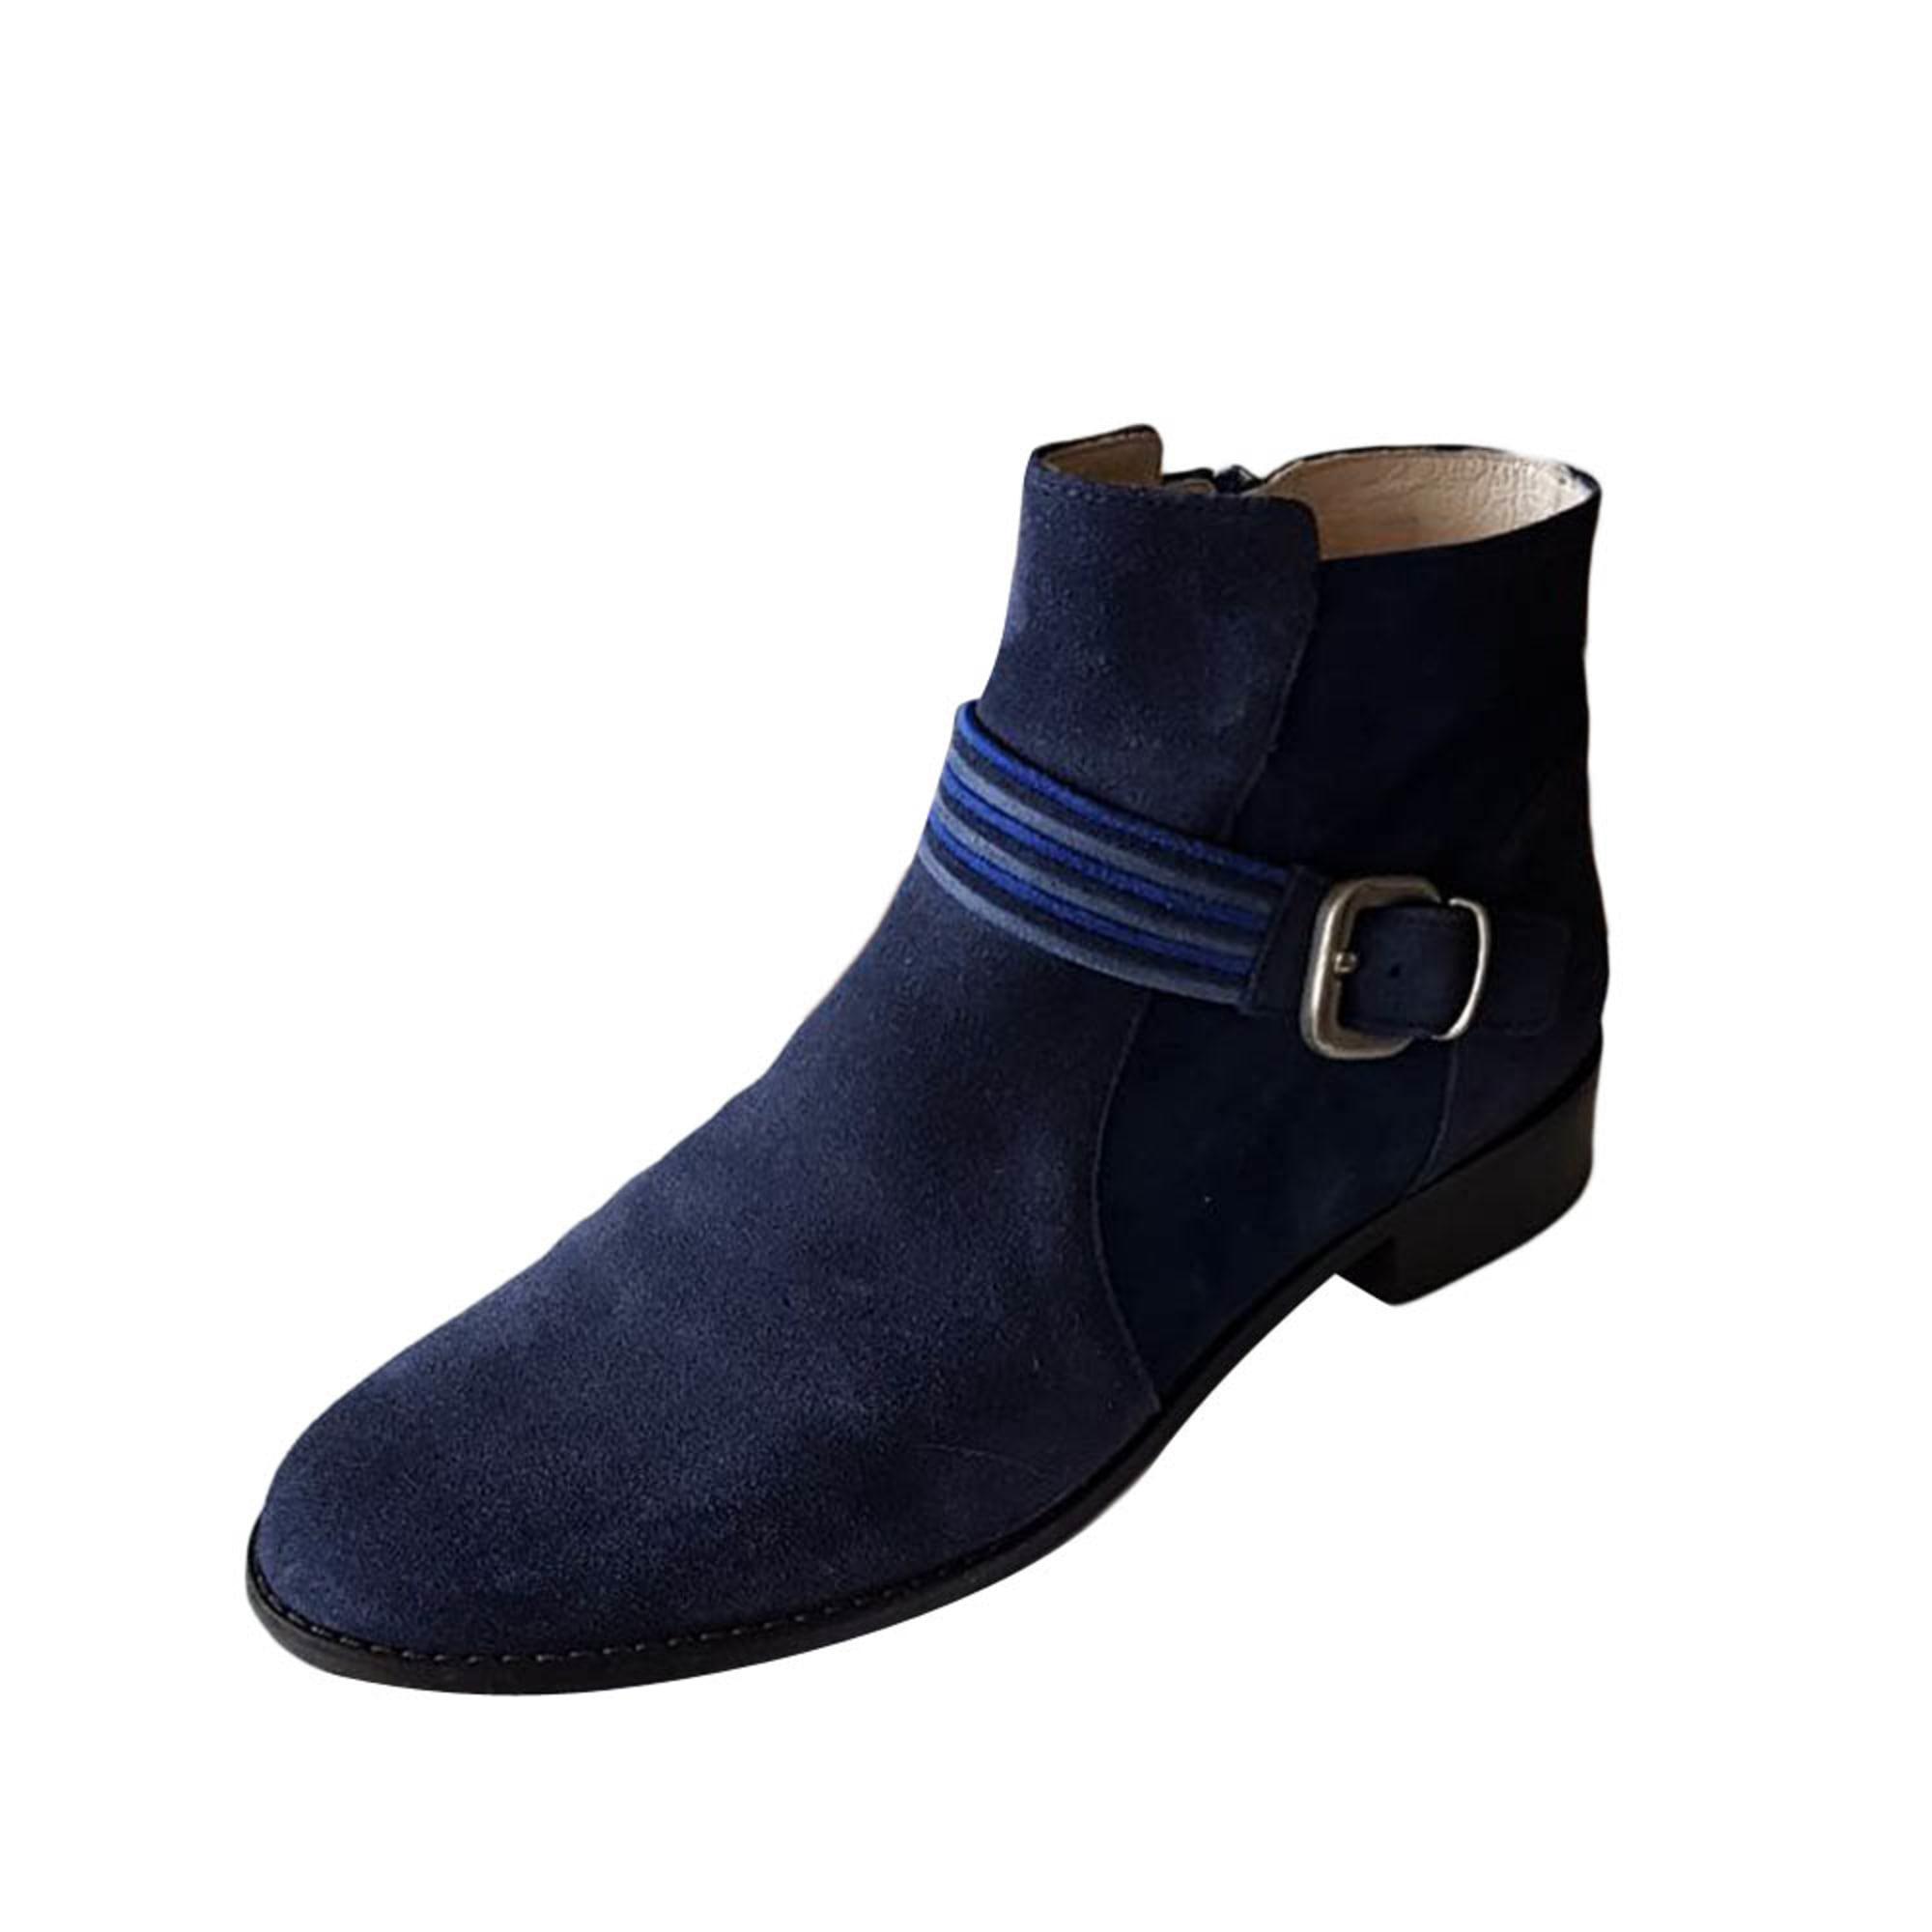 65cbe30f288e0e Santiags, bottines, low boots cowboy MELLOW YELLOW Bleu, bleu marine, bleu  turquoise